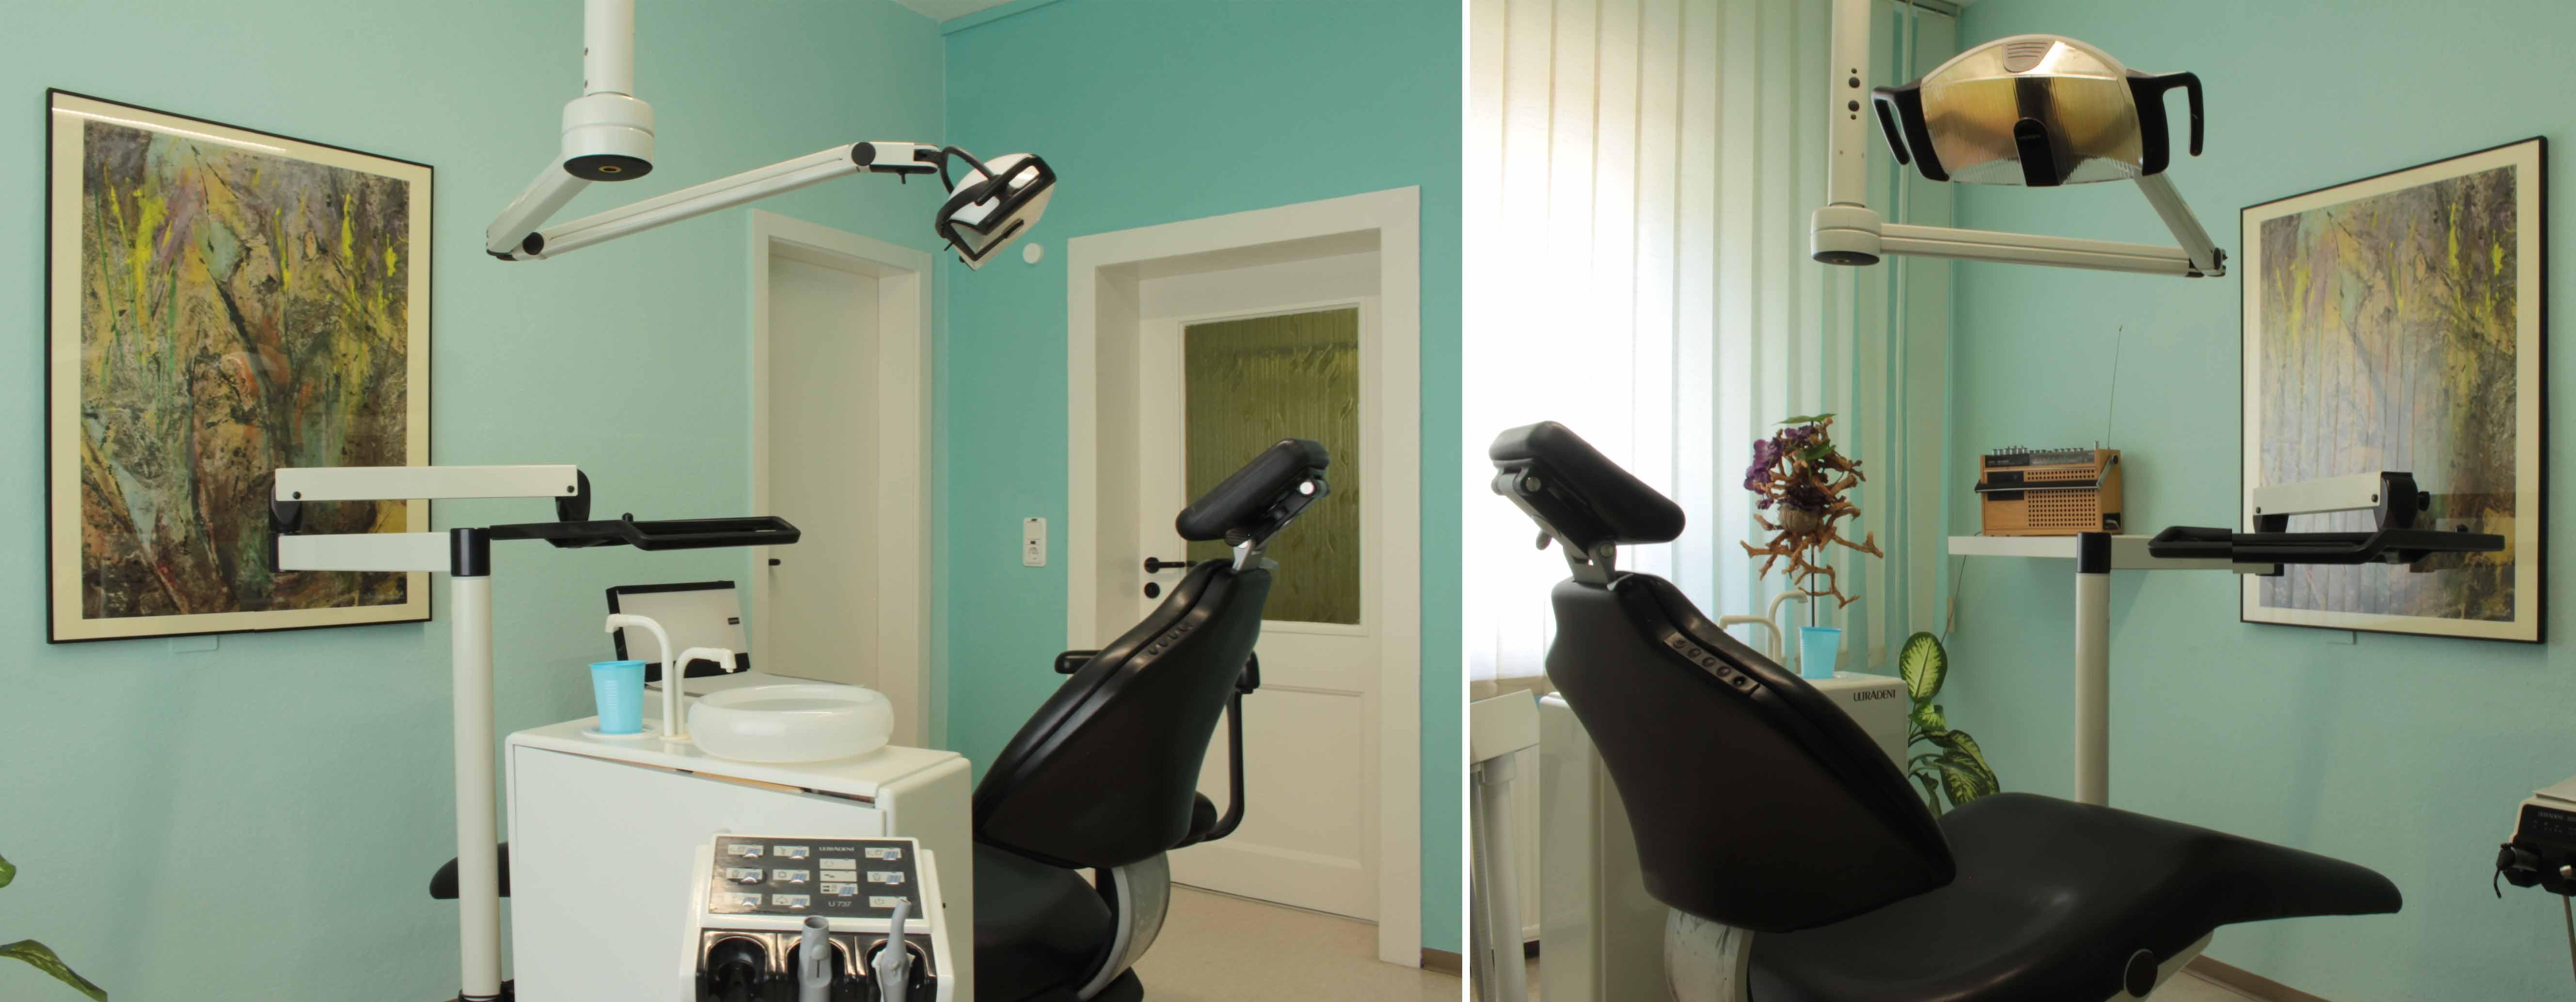 Sprechzimmer 1 der Praxis - Zahnarztpraxis im Zerbster Zentrum - Zahnarzt Dr. med. Bernd Lux